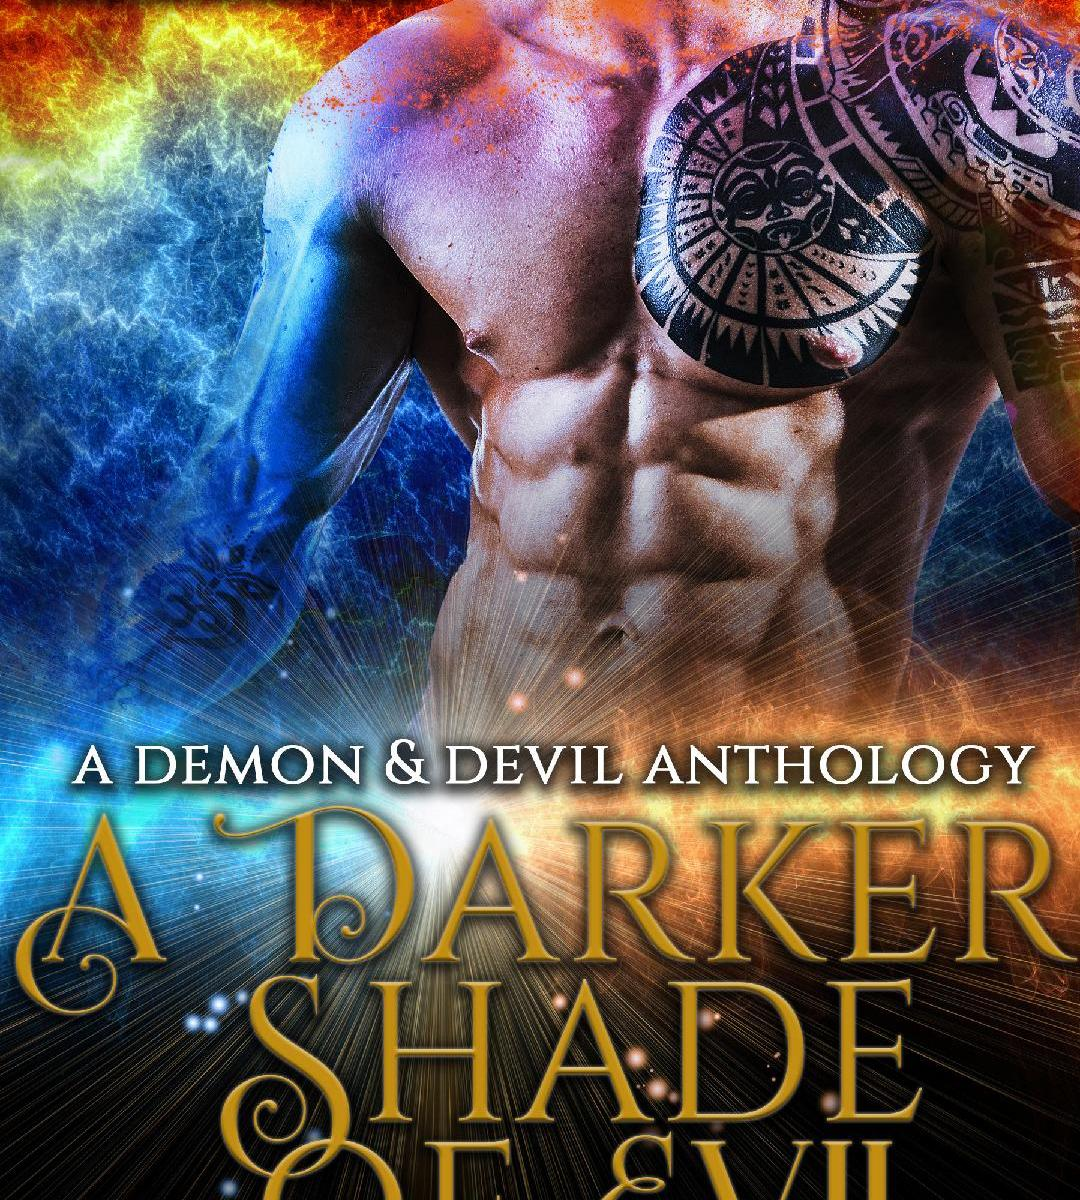 A Darker Shade of Evil - Demon and Devil Anthology on Alternative-Read.com